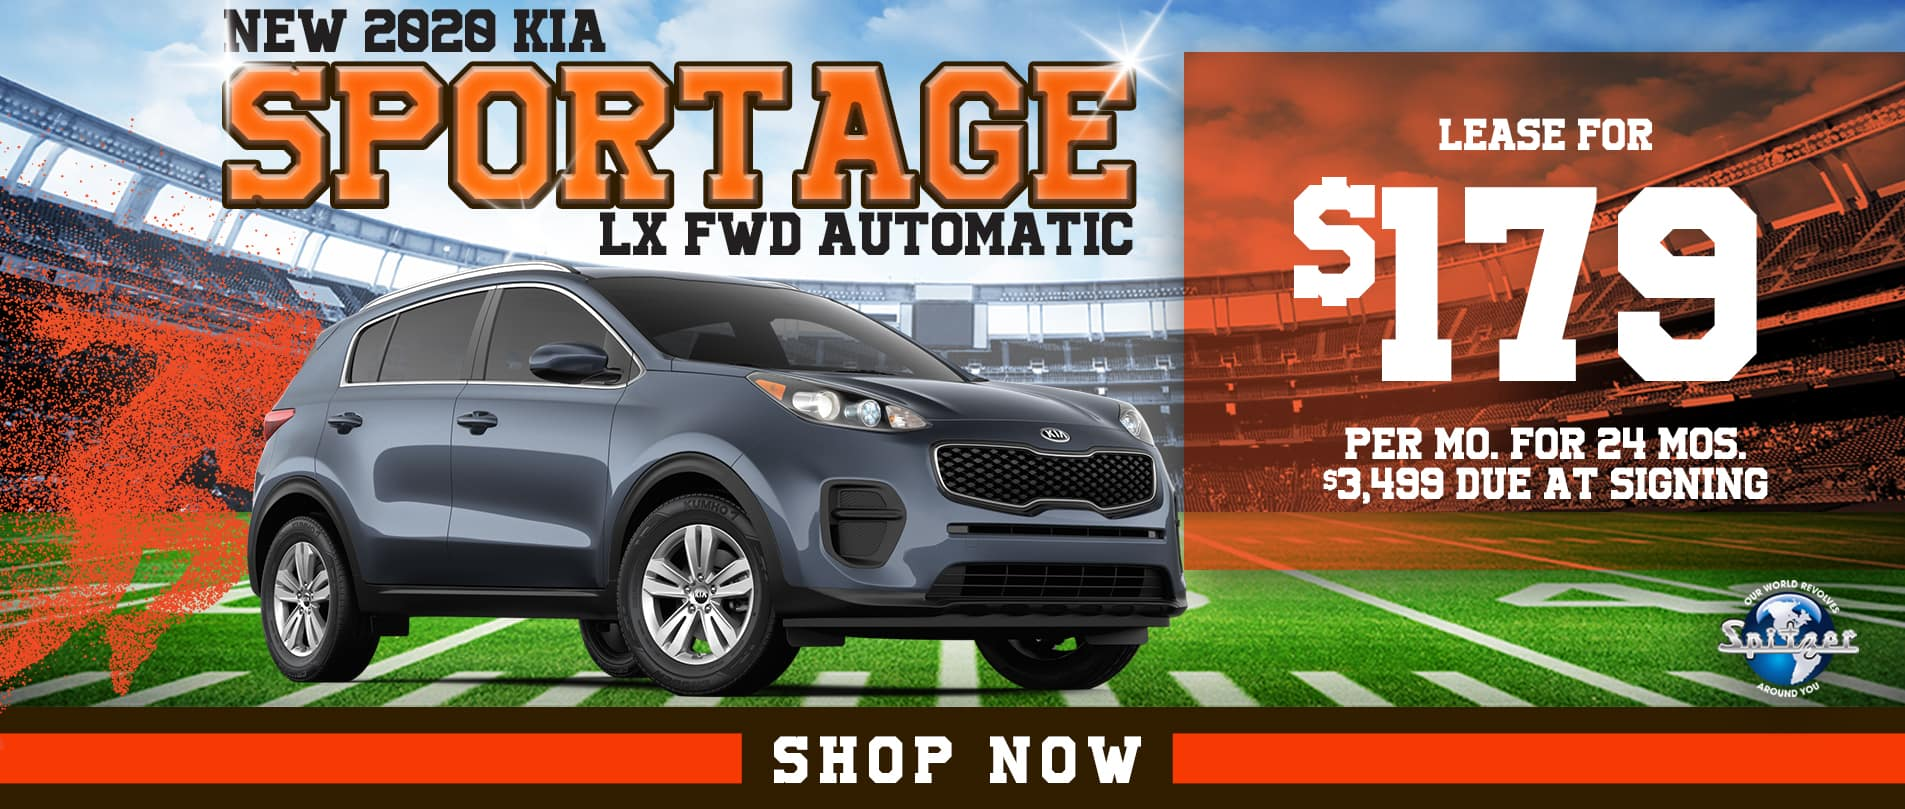 Sportage | Lease for $179 per mo